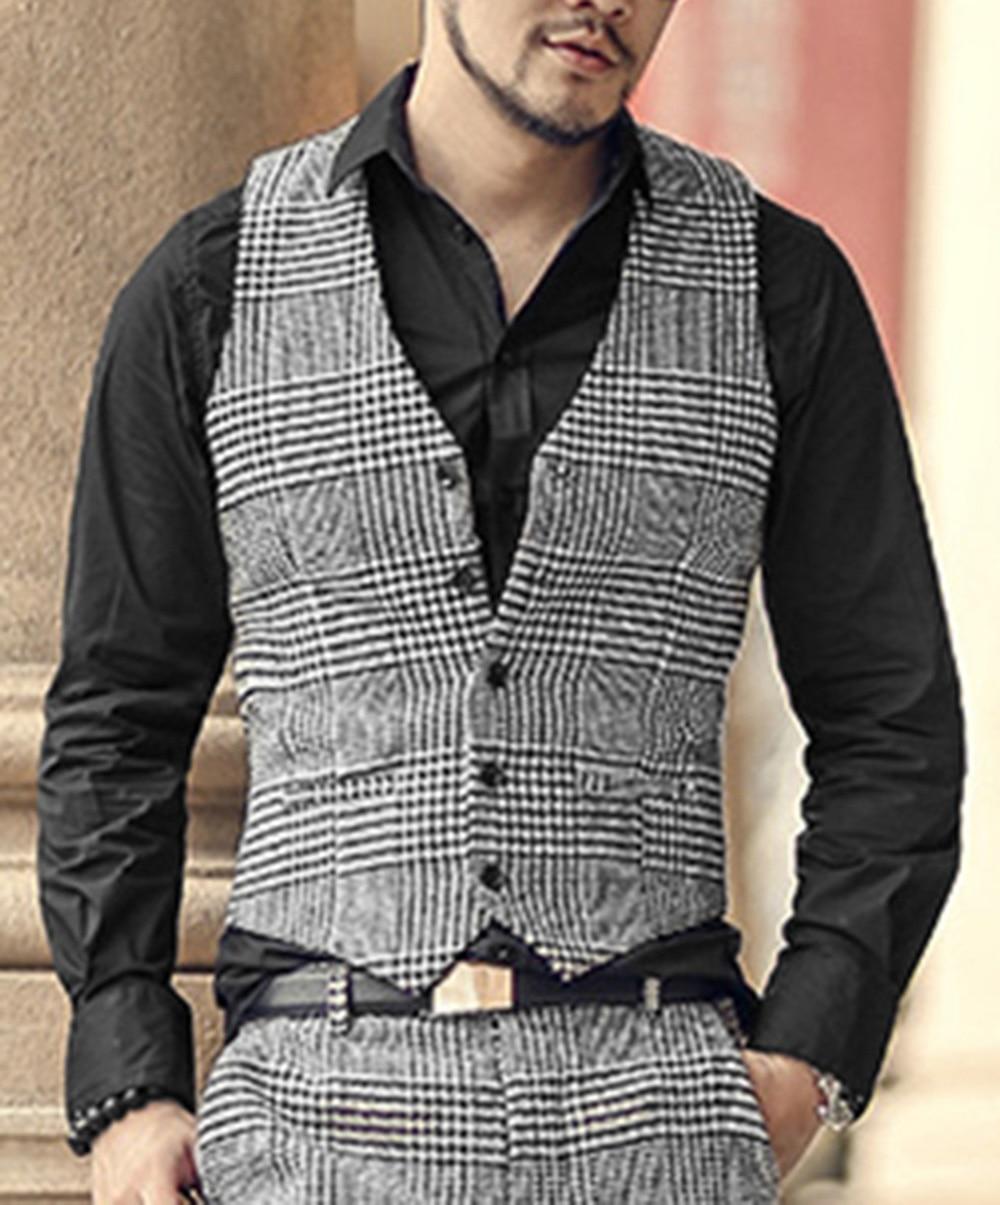 2018-New-arrival-winter-men-s-woolen-casual-plaid-European-style-vest-Mens-slim-fashion-brand (3)